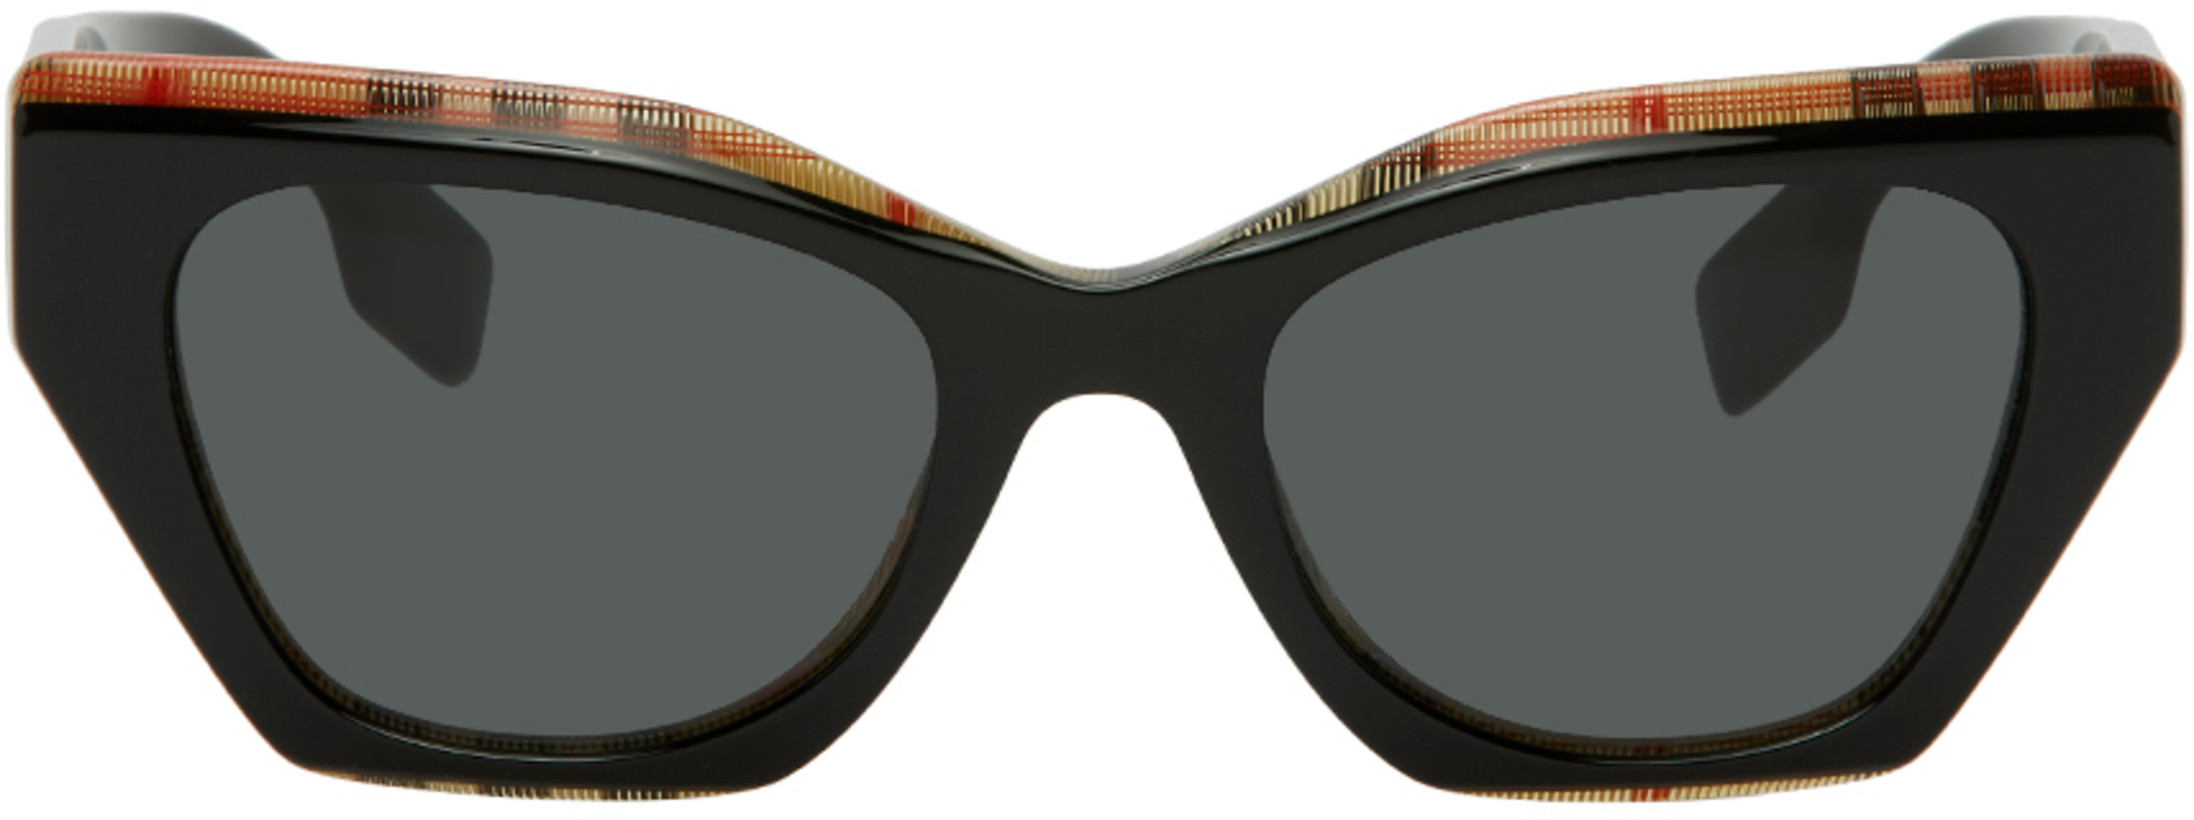 Burberry — Black Check Cat-Eye Sunglasses